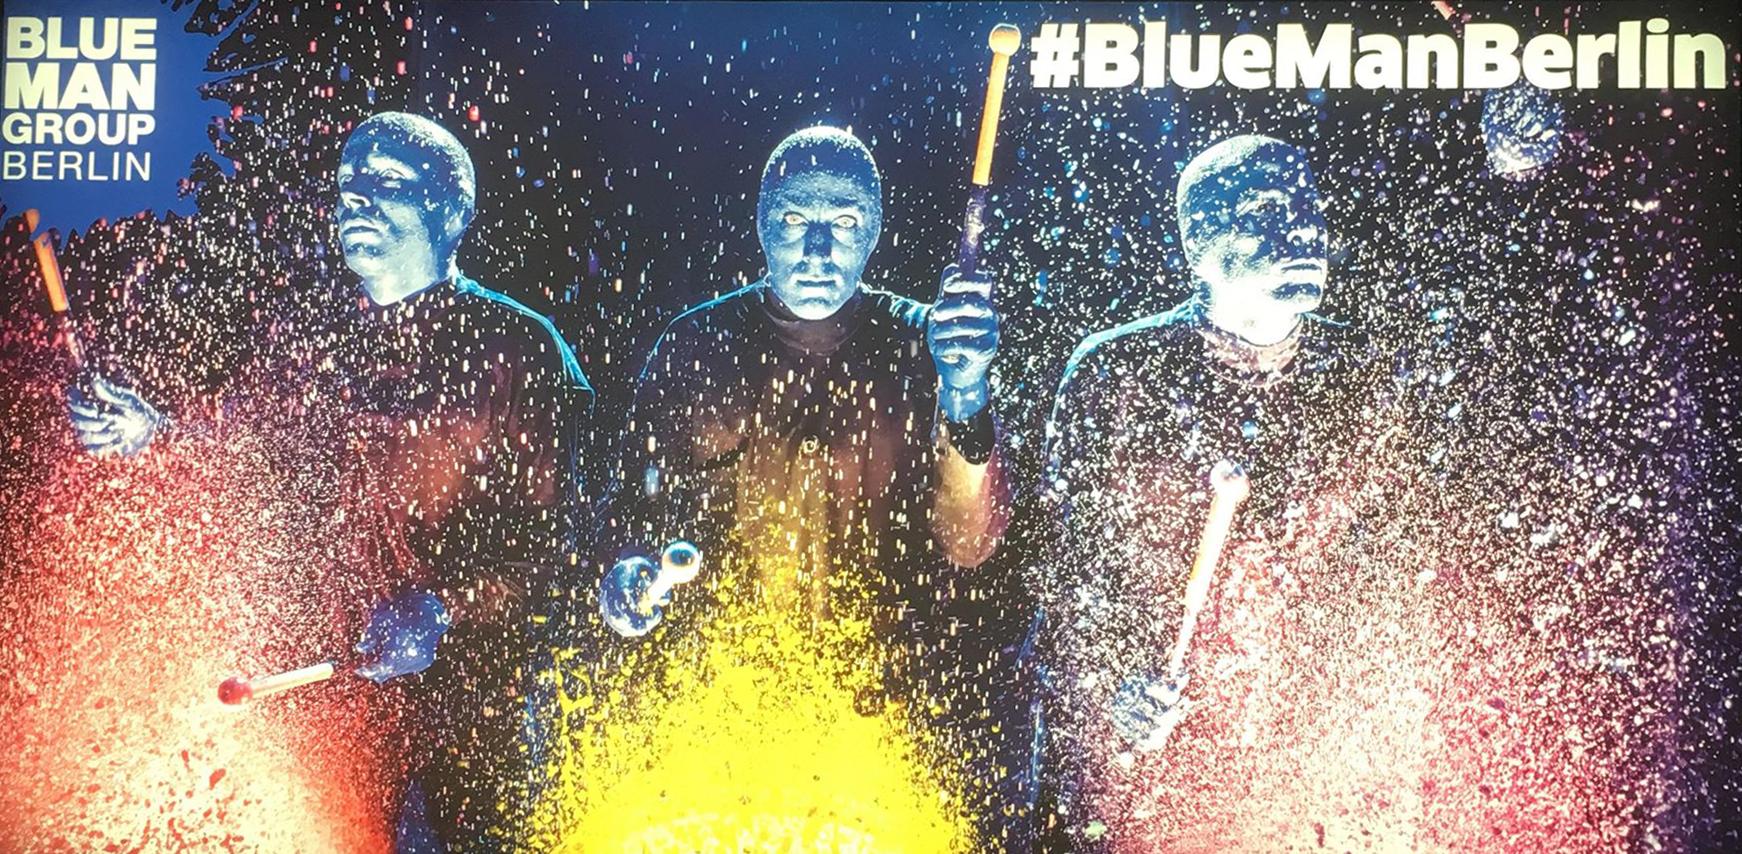 Weihnachten Alex Bohlig Blue Man Group Berlin Glückskämpfer e.V. 11